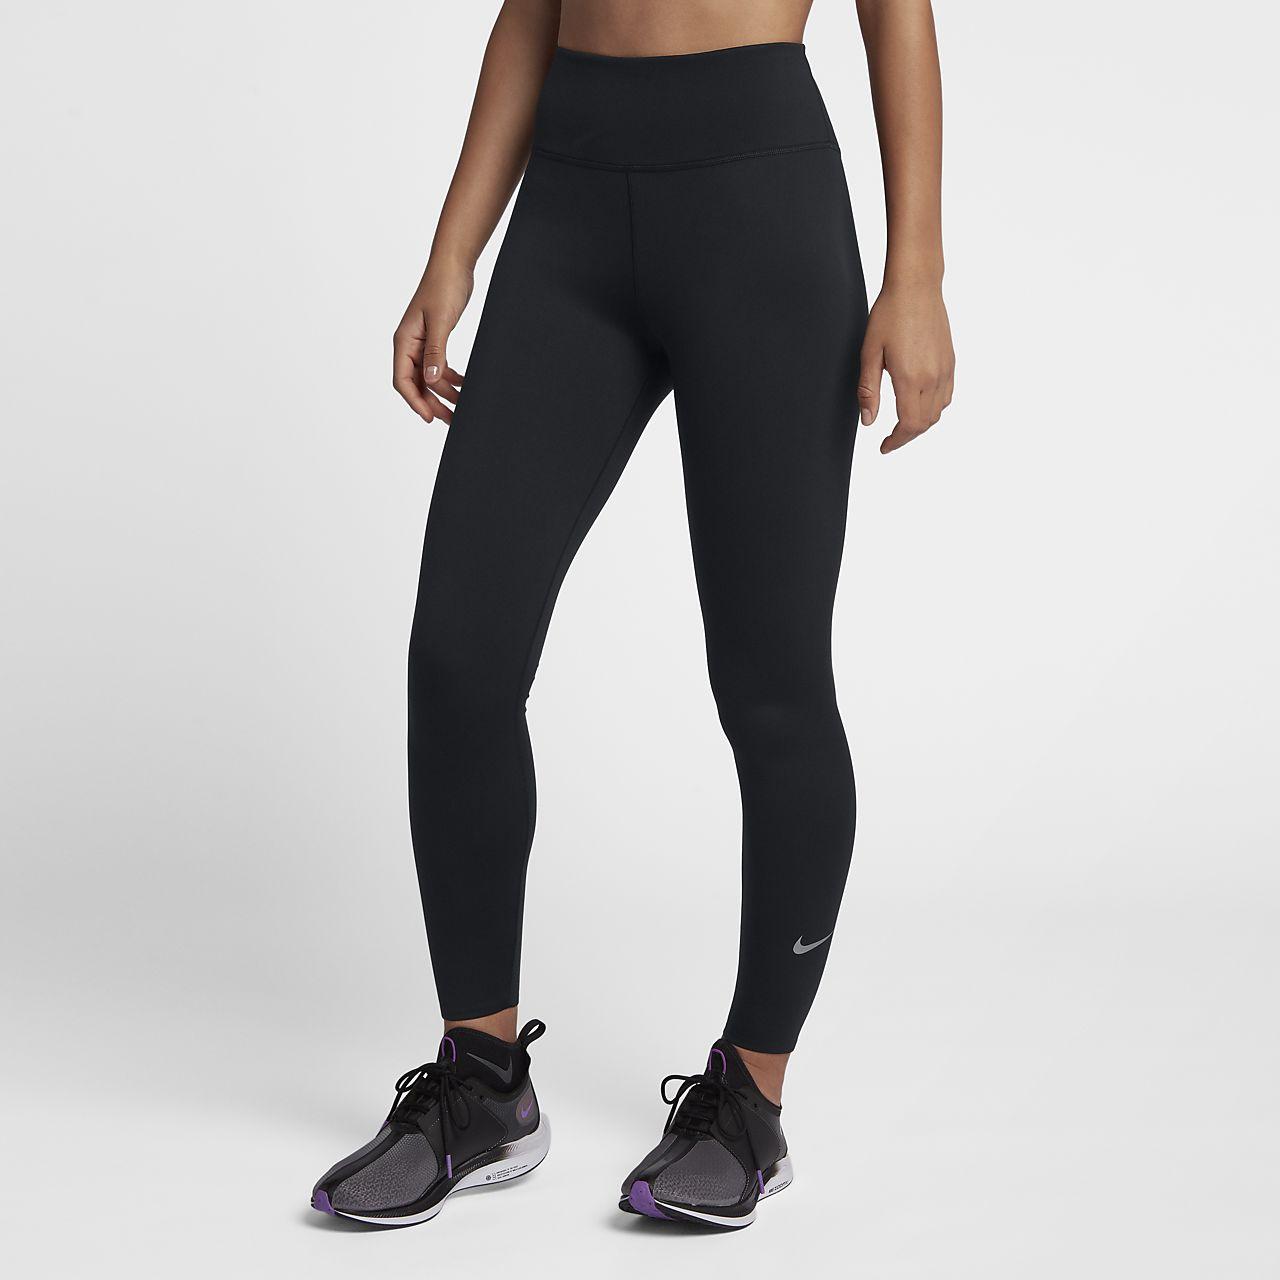 NikeLab Women's Tights